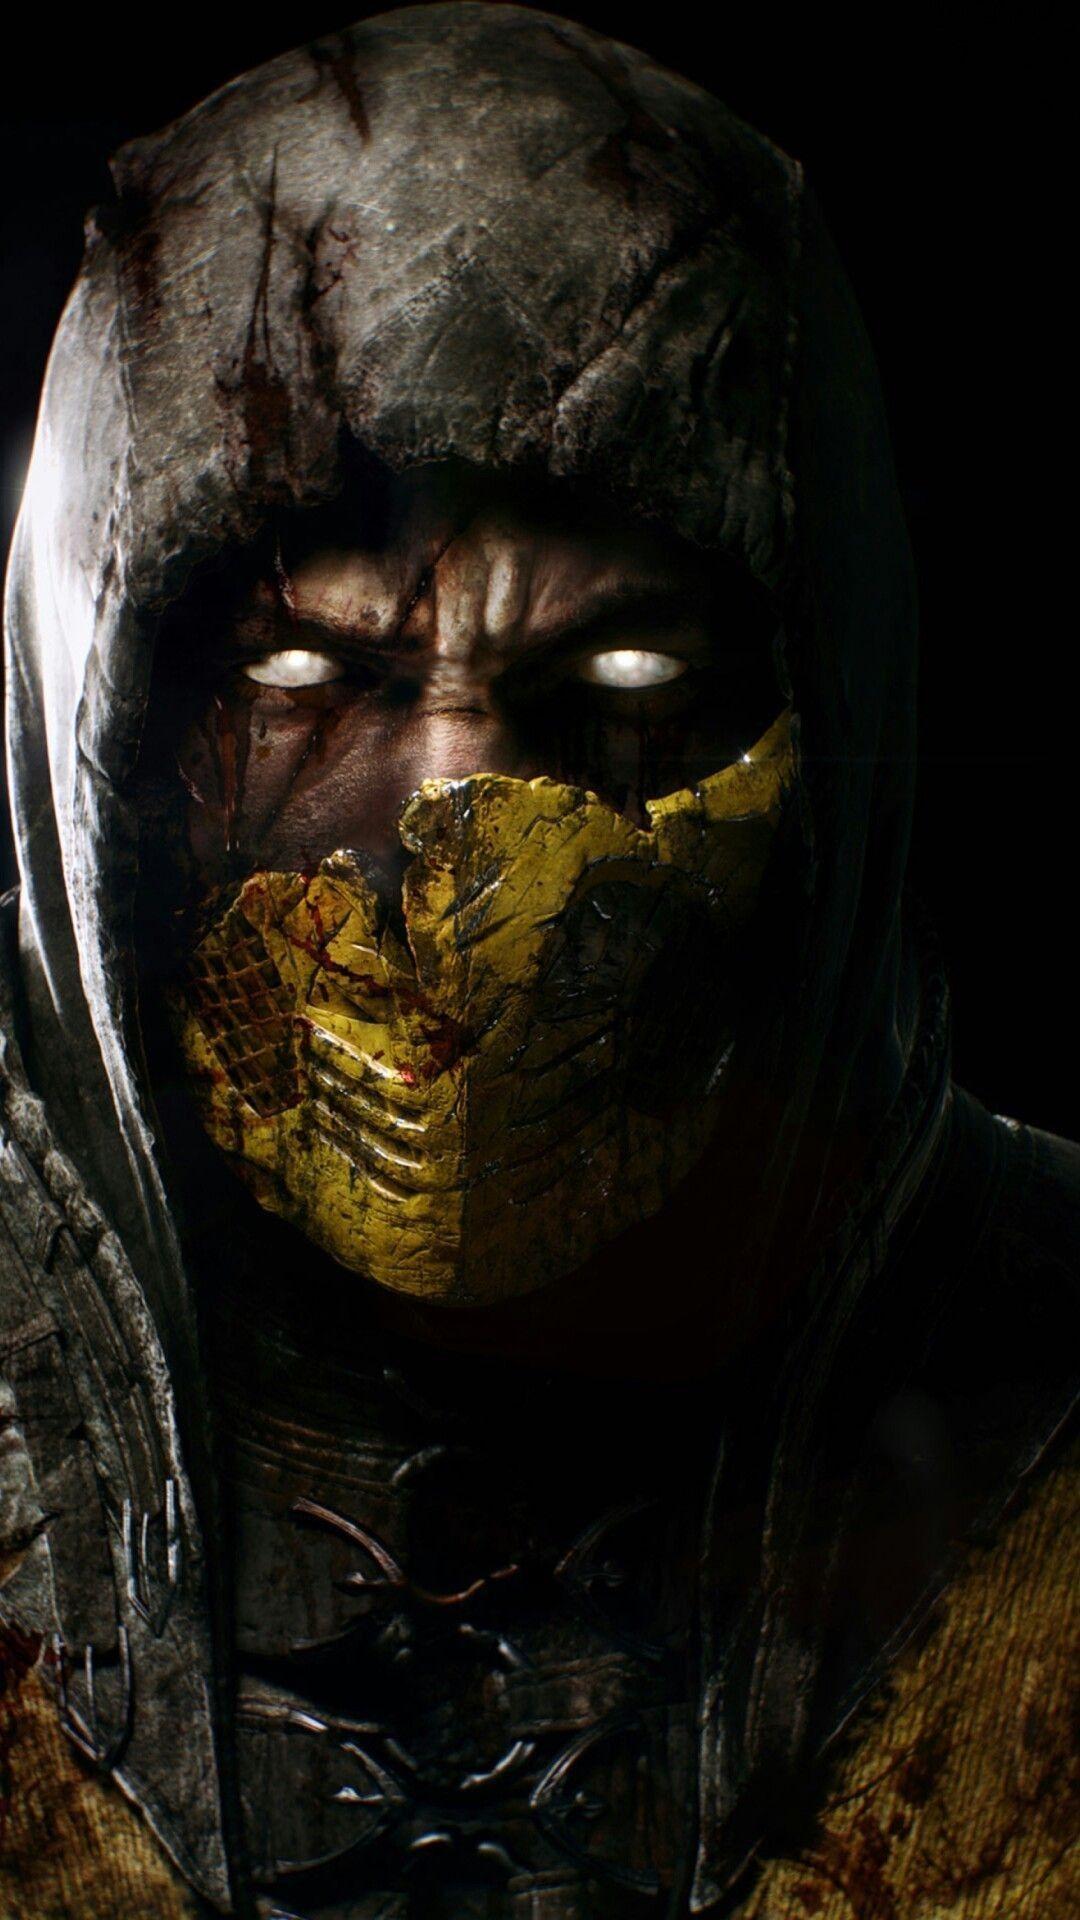 Scorpion Mortal Kombat Phone wallpaper Scorpion mortal